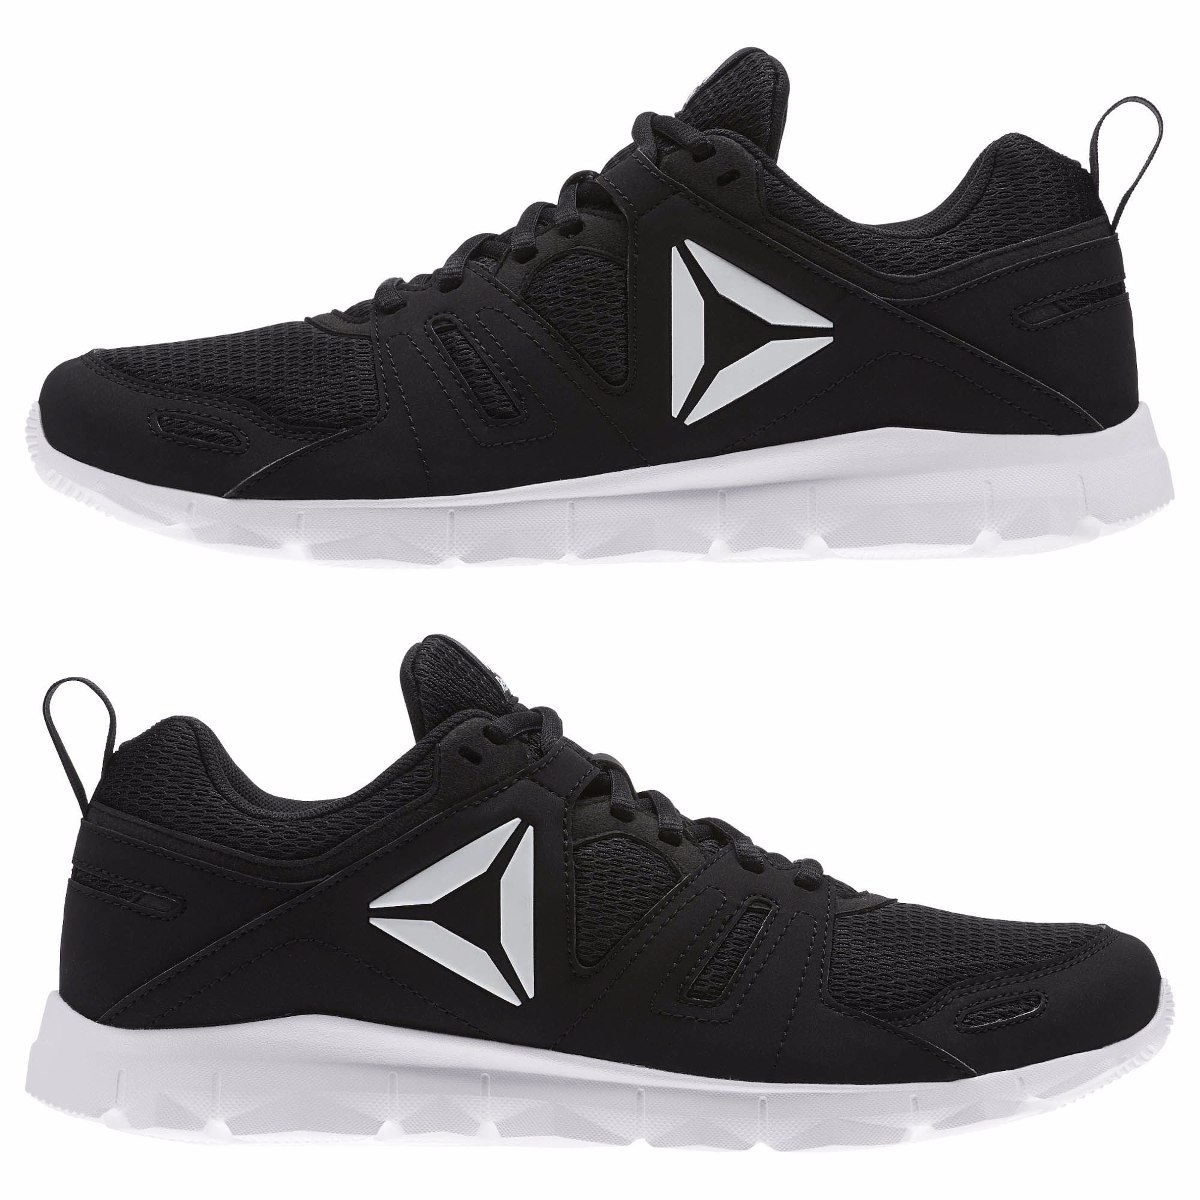 27230017f06 Tenis Hombre Fitness  Training Reebok Dashhex Tr 2.0(bs8179 ...